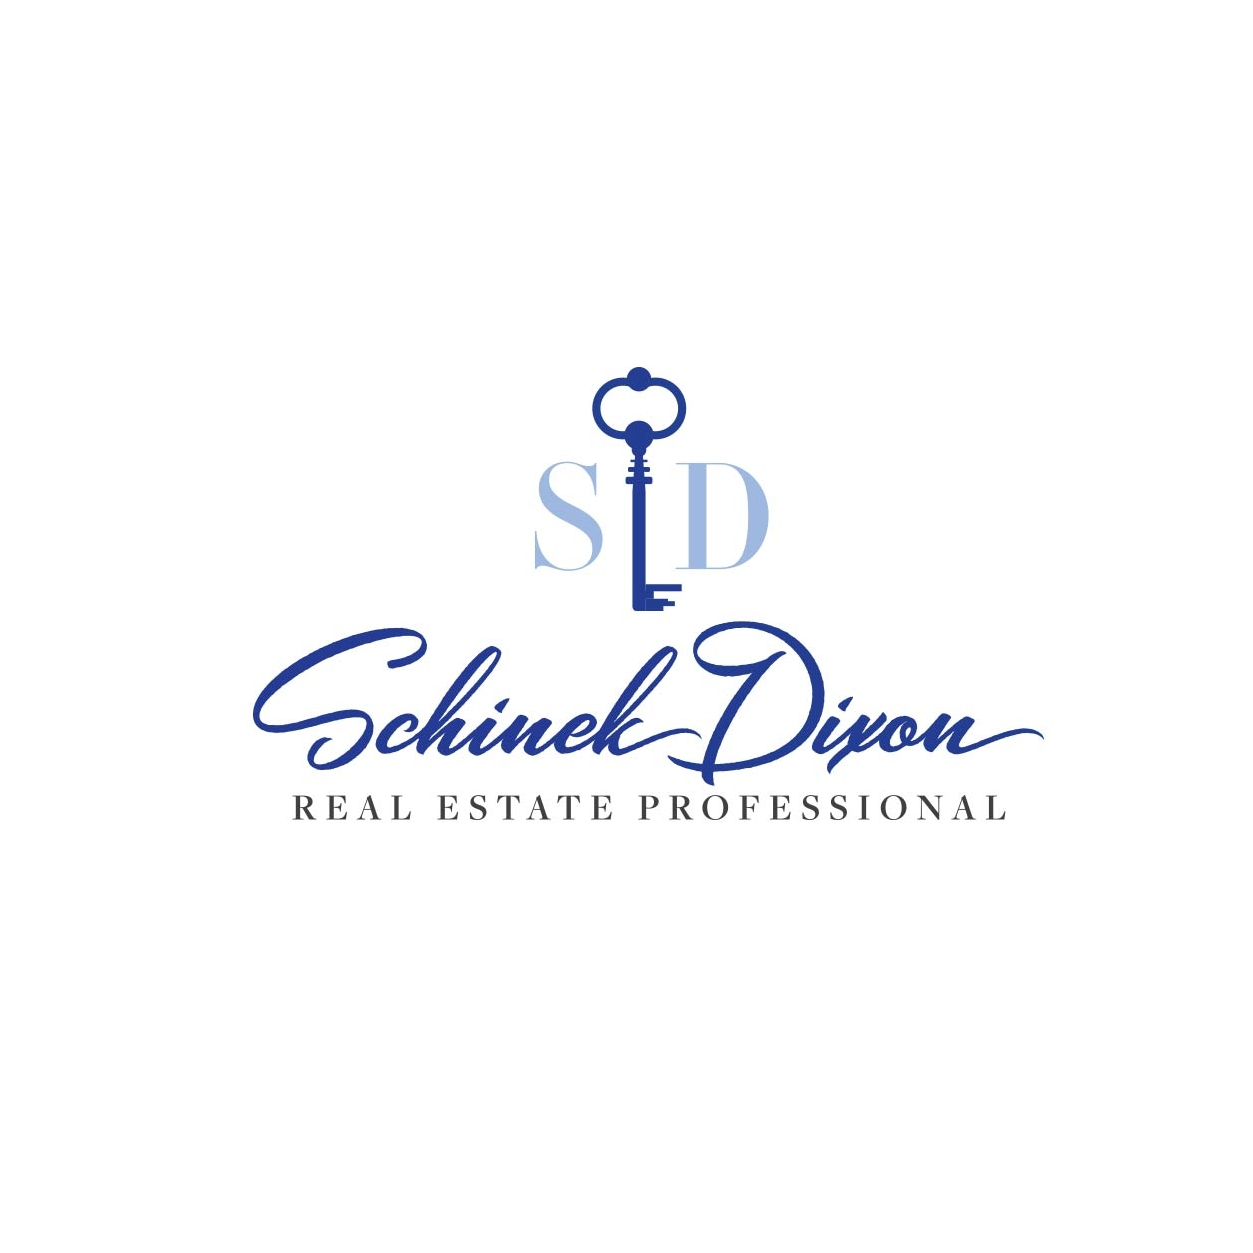 SD_Logo1_portfolio.jpg